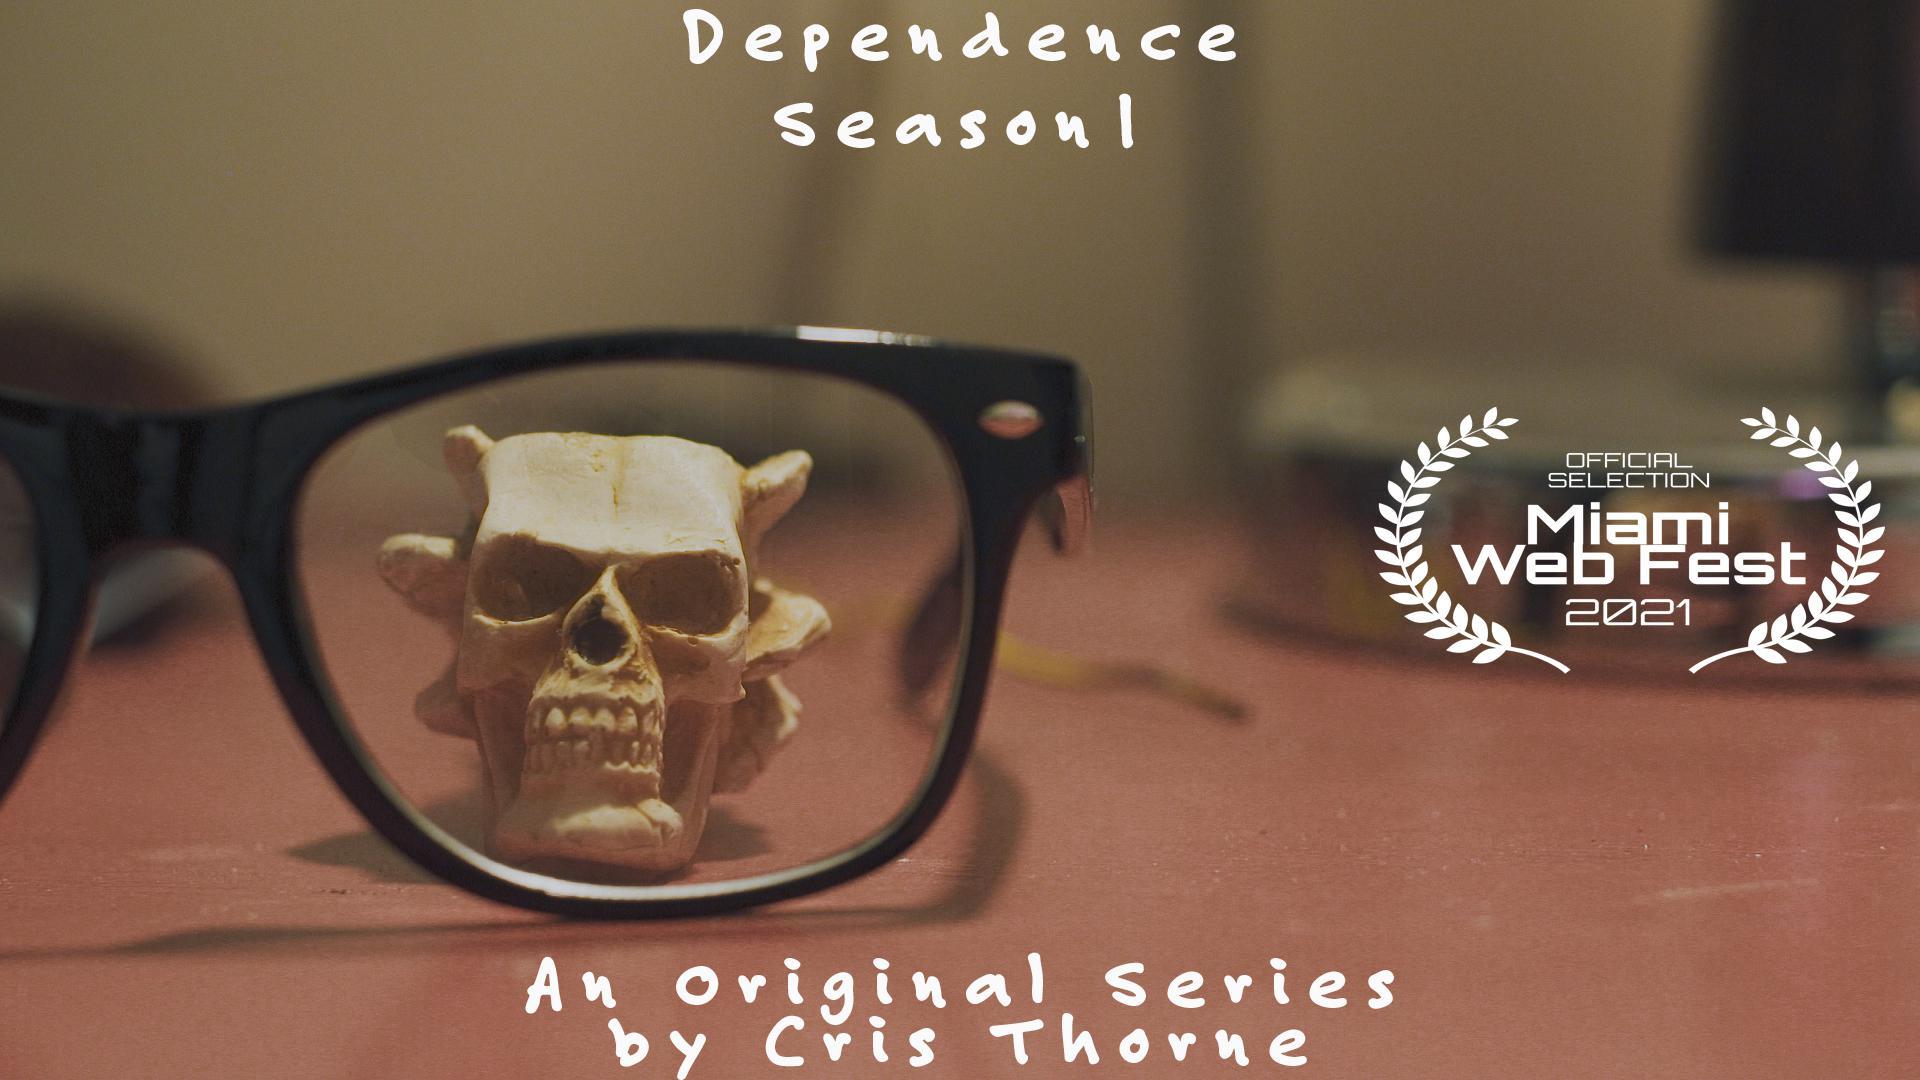 Dependence (Season 1)